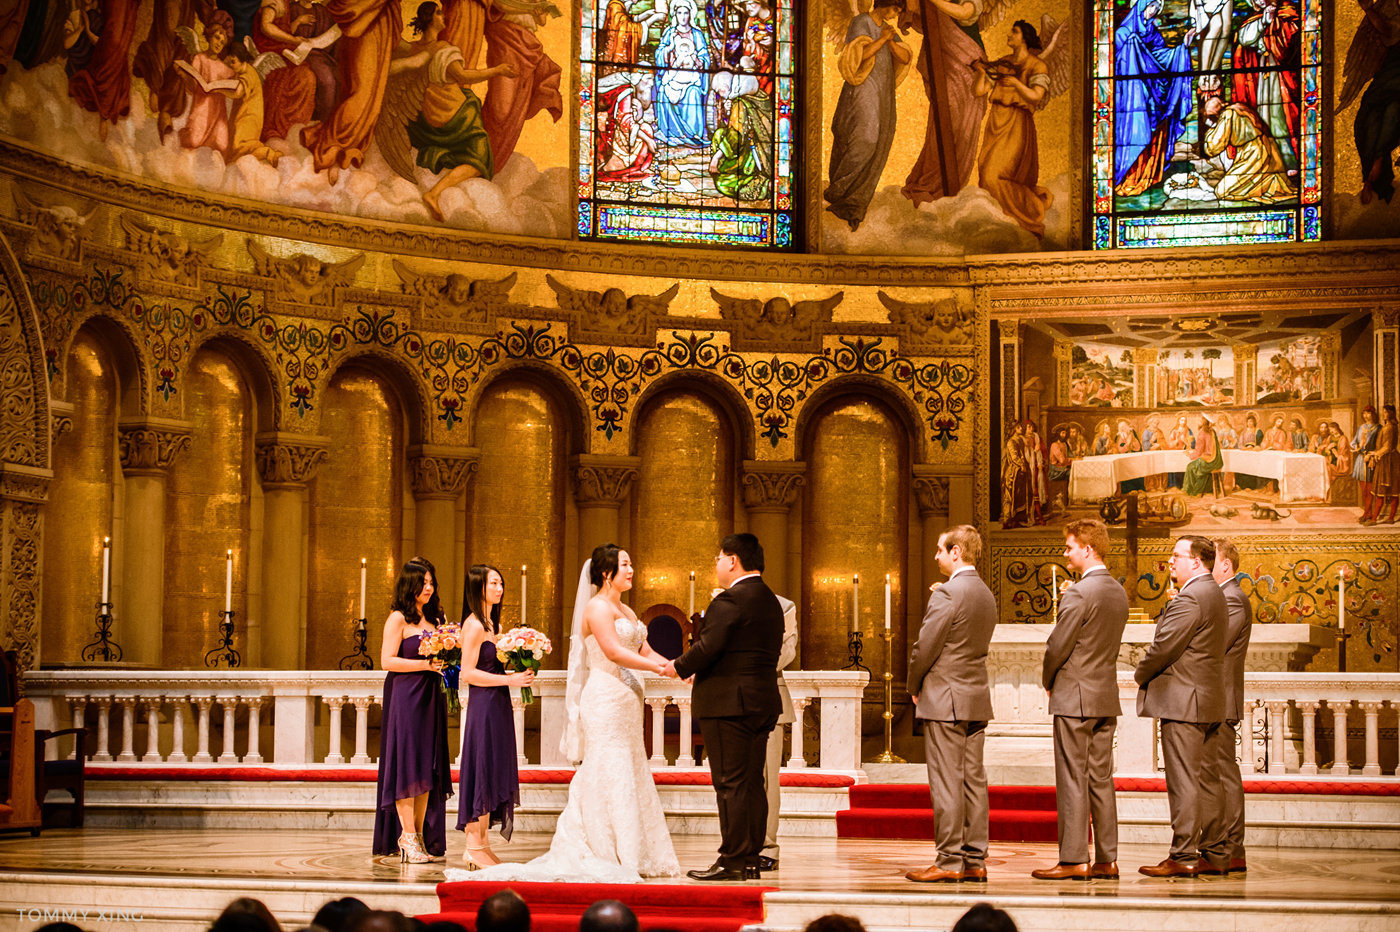 STANFORD MEMORIAL CHURCH WEDDING - Wenjie & Chengcheng - SAN FRANCISCO BAY AREA 斯坦福教堂婚礼跟拍 - 洛杉矶婚礼婚纱照摄影师 Tommy Xing Photography101.jpg